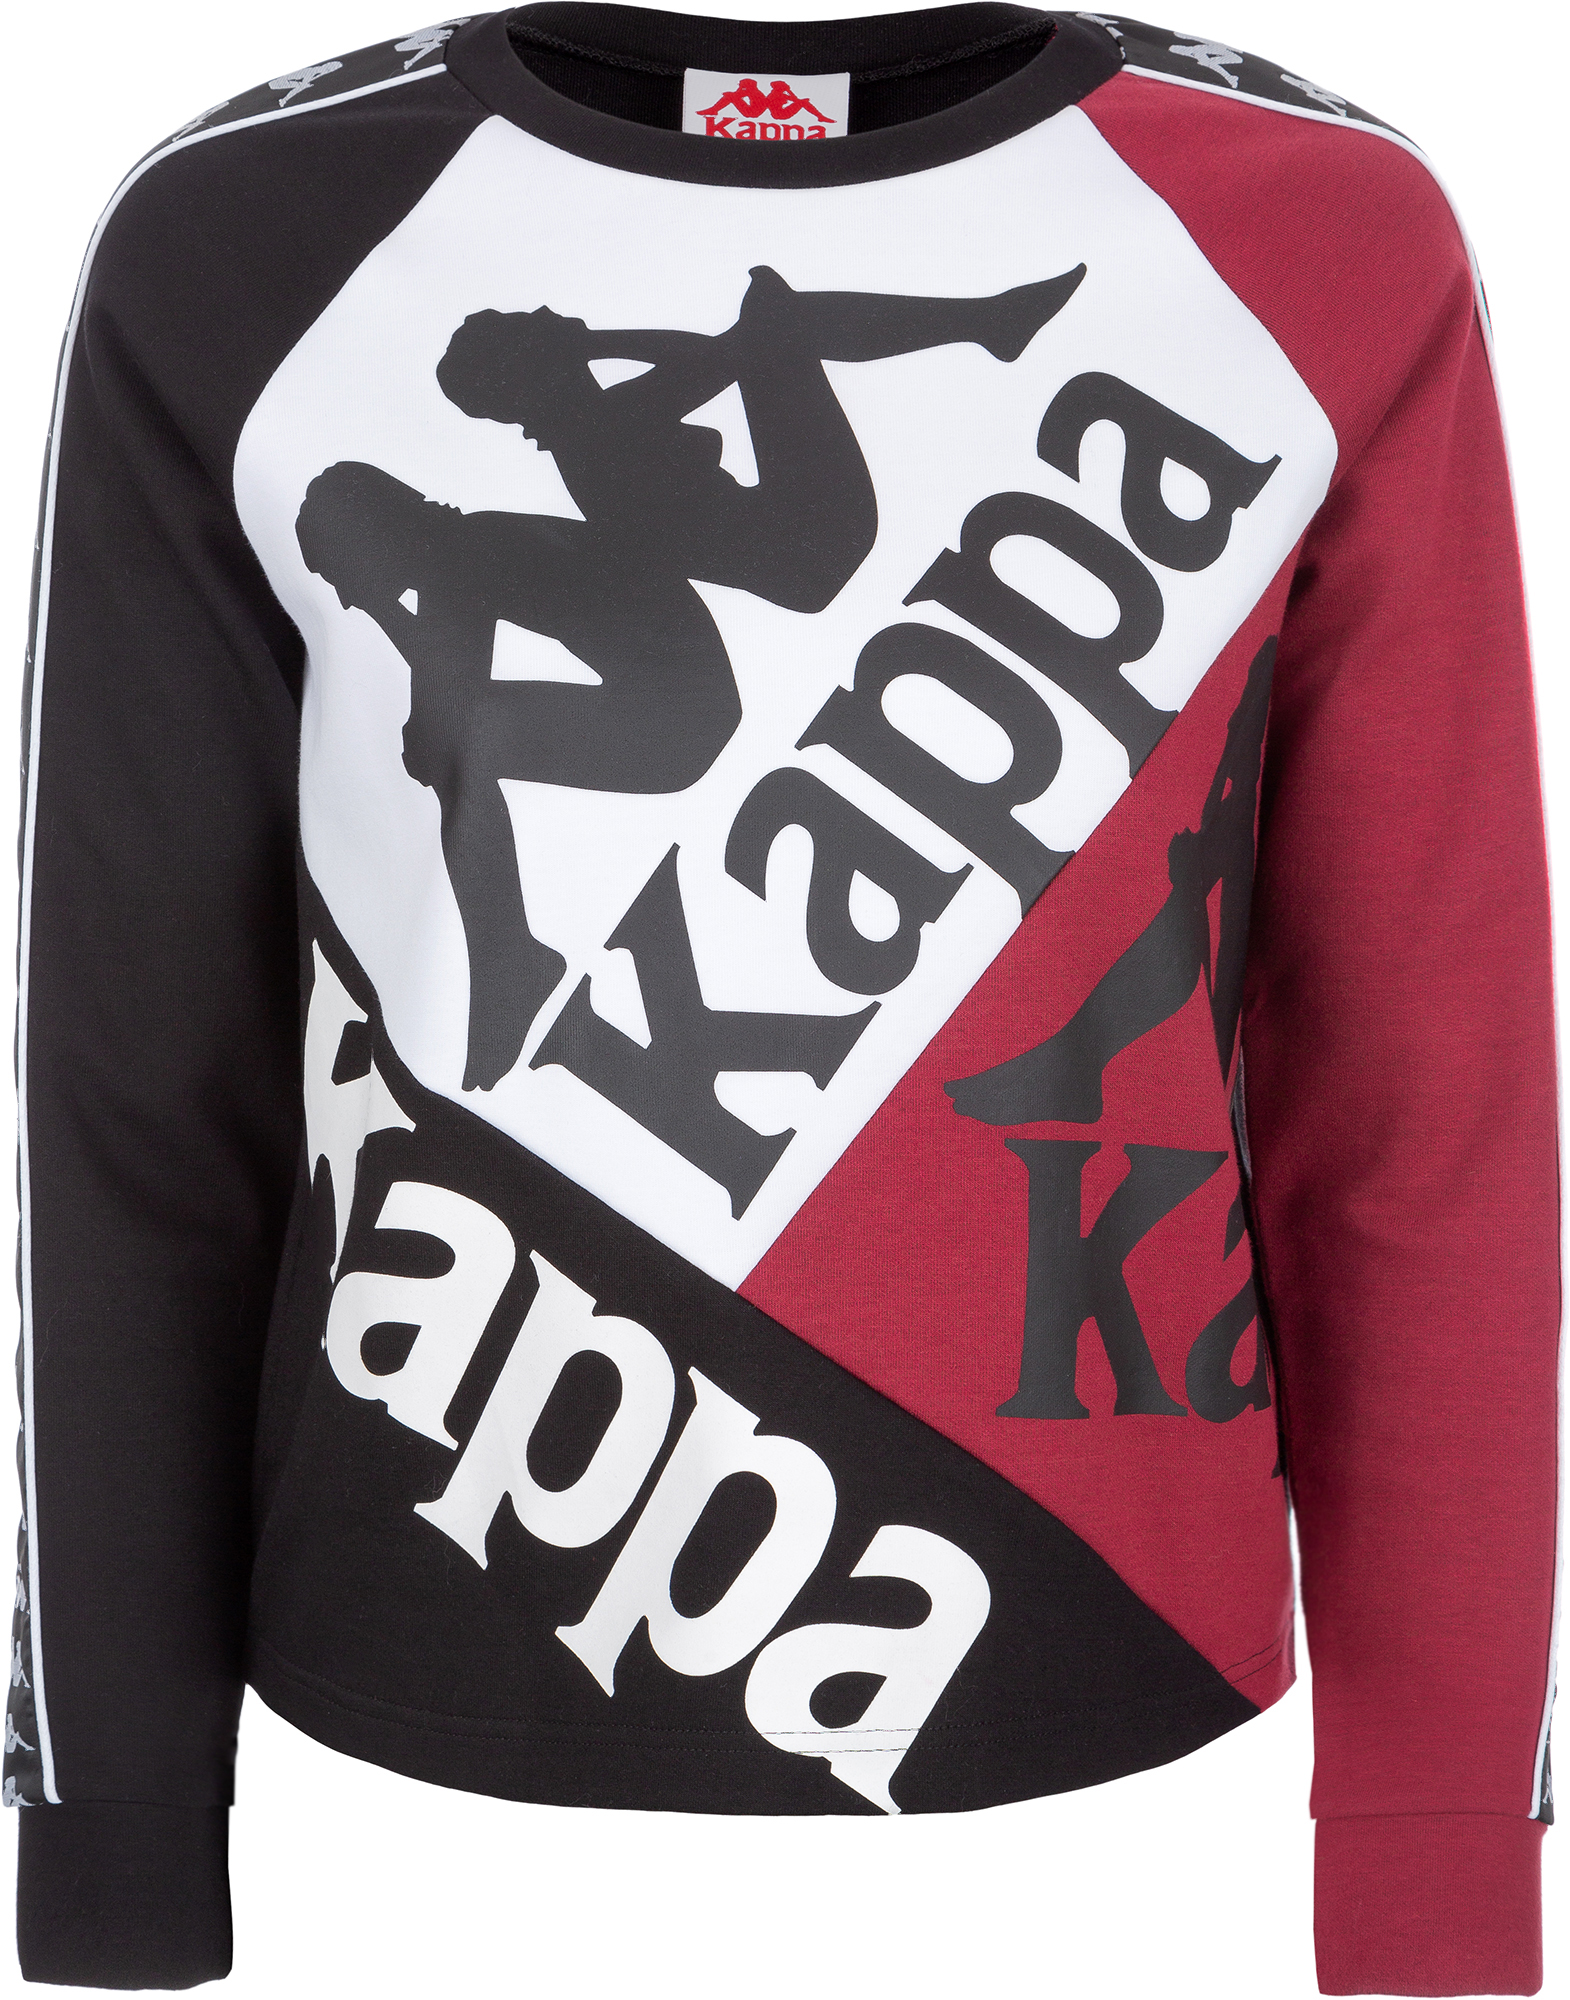 цена Kappa Свитшот женский Kappa, размер 44 онлайн в 2017 году